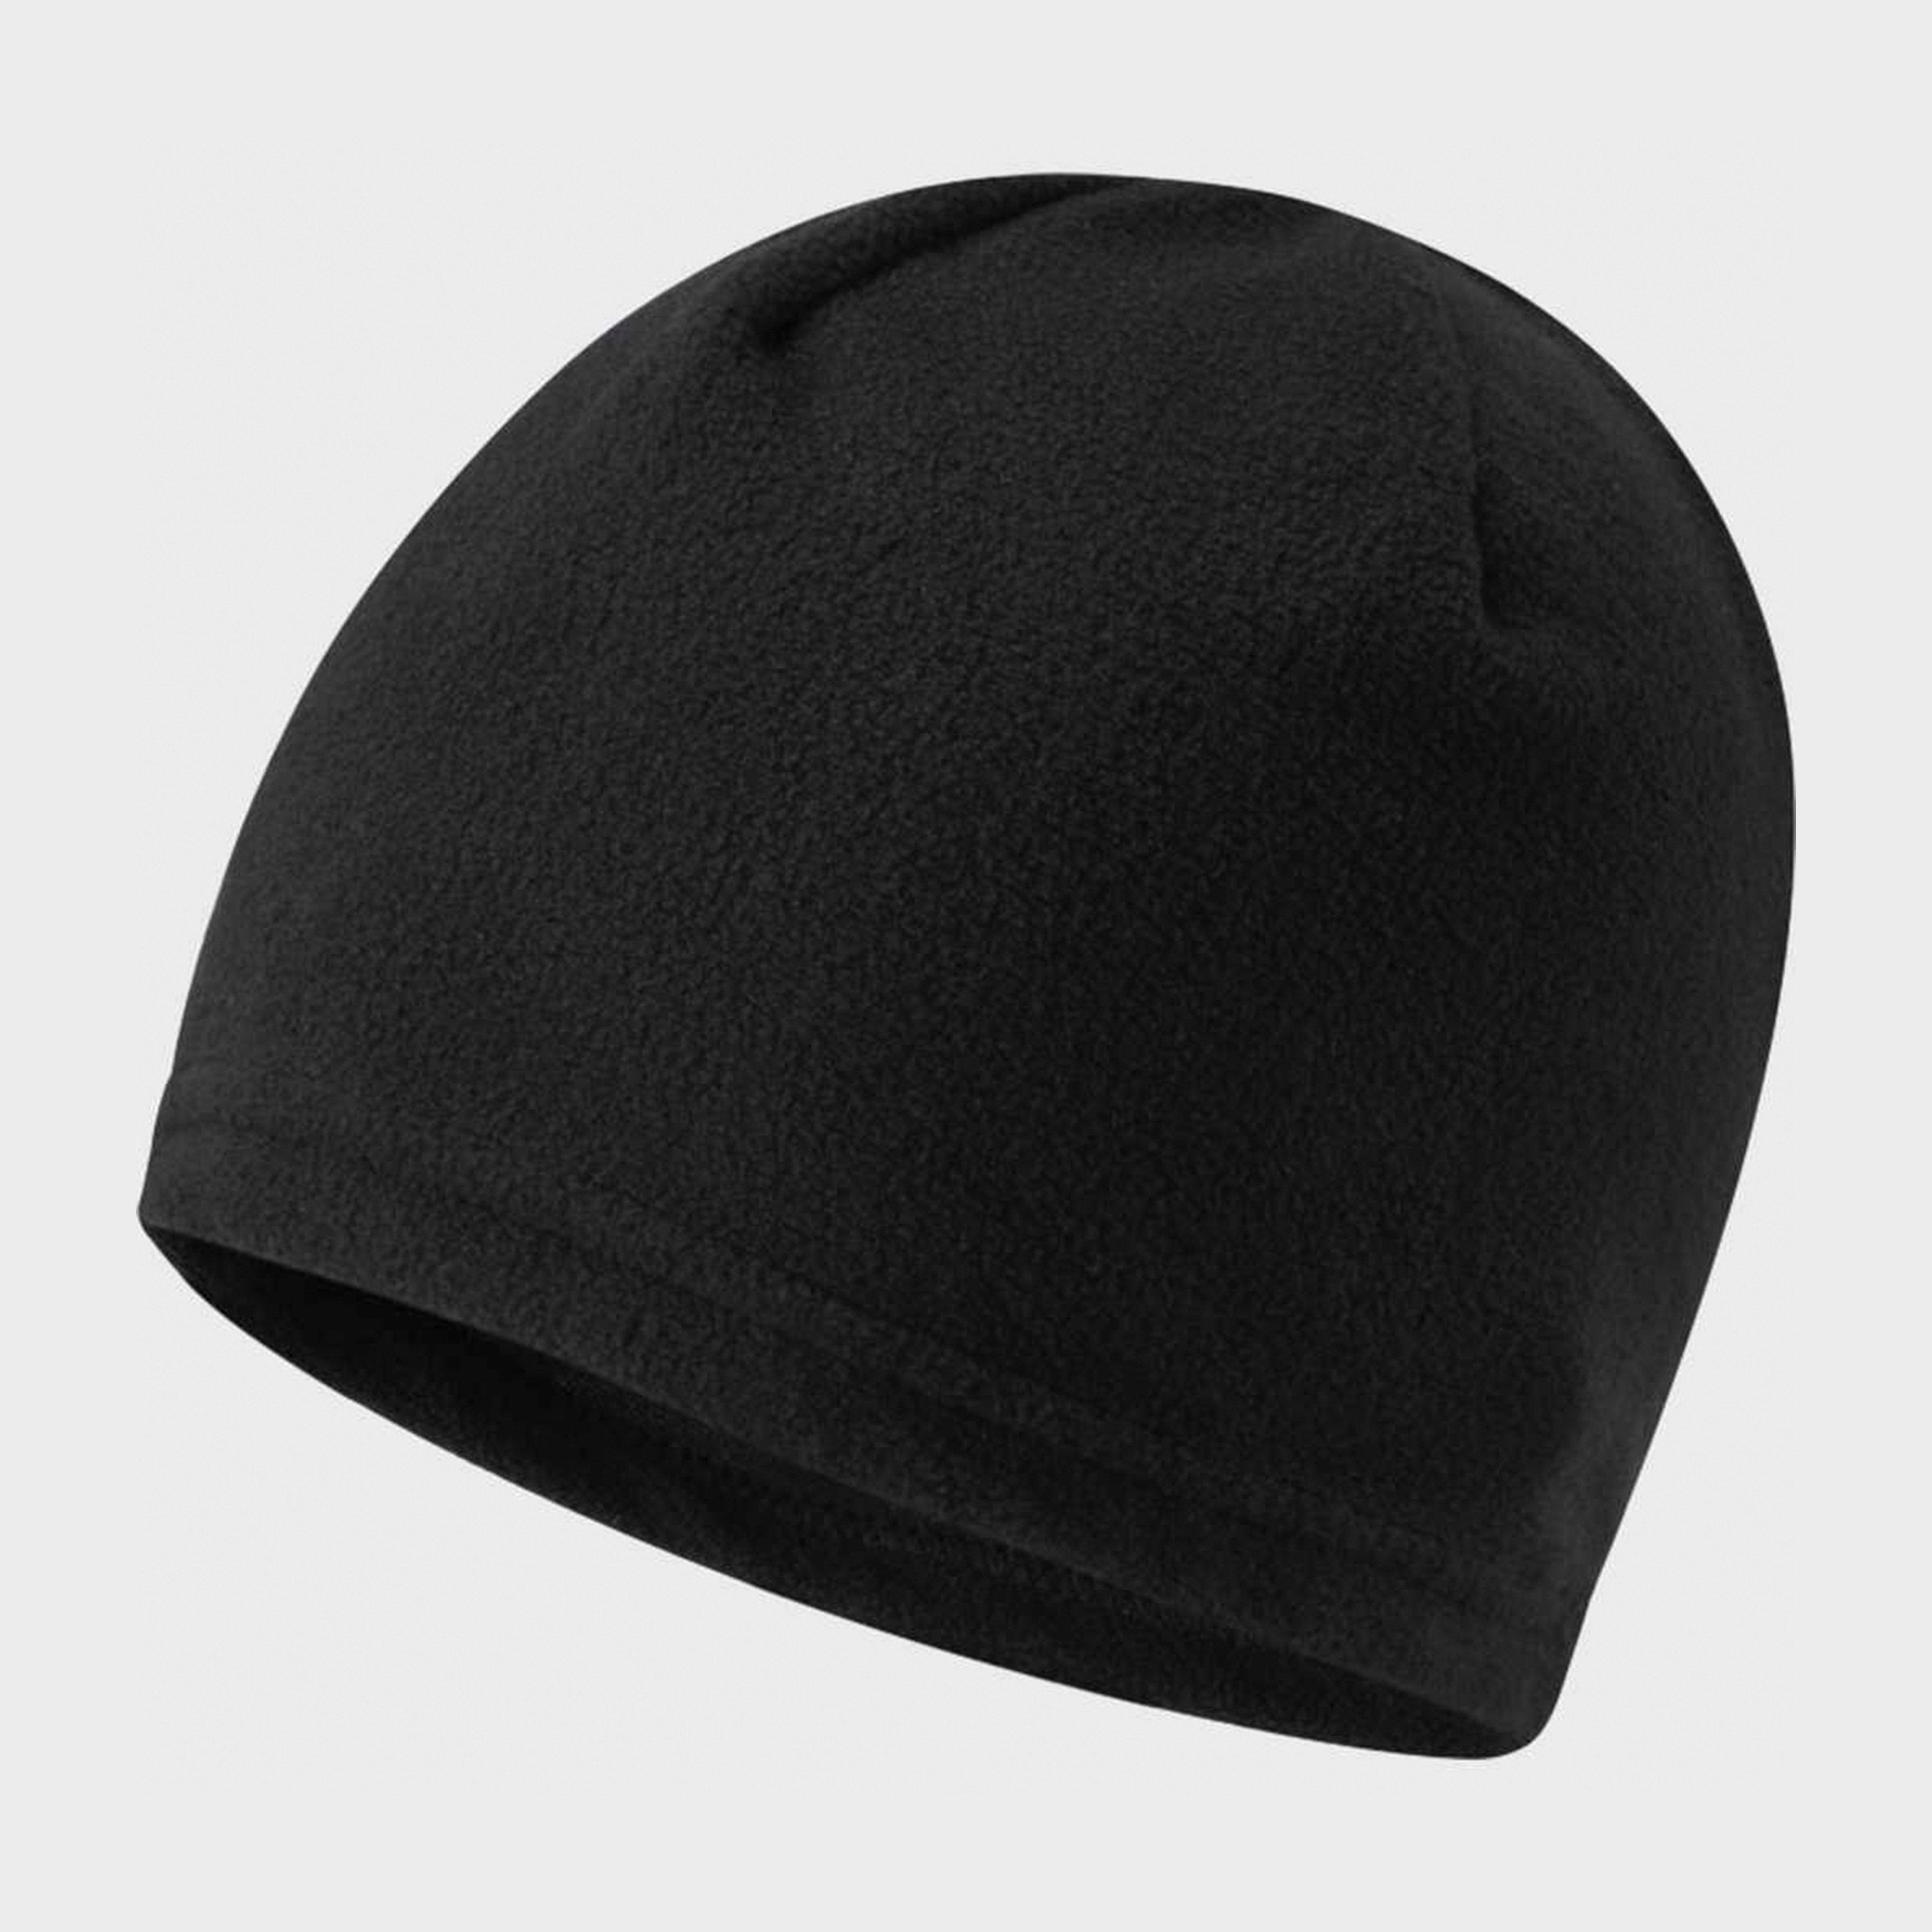 Freedomtrail Freedomtrail Essential Fleece Hat (Unisex)